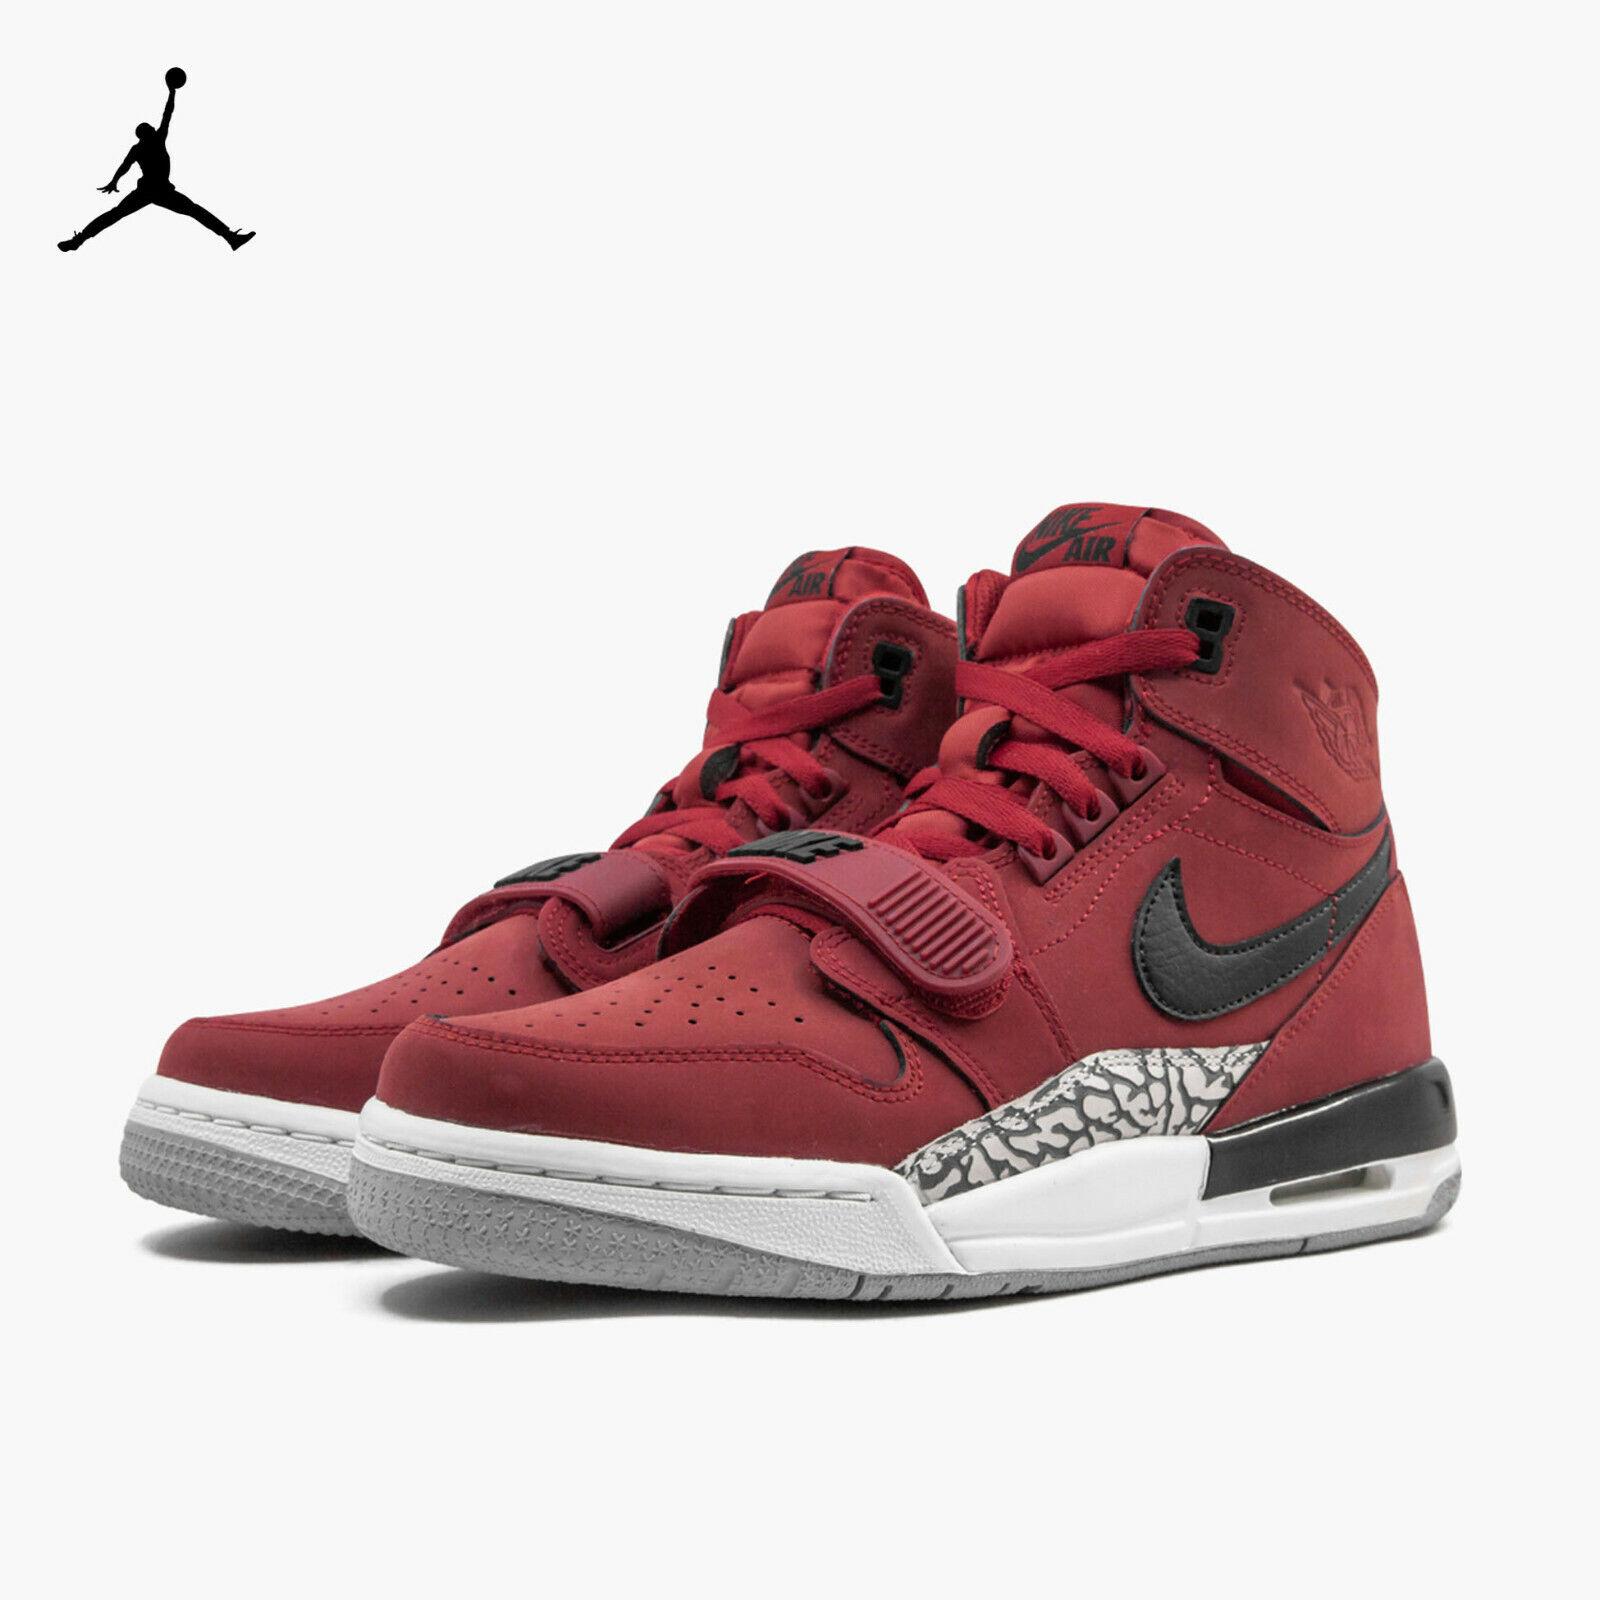 Nike Air Jordan Legacy 312 GS Boys Shoes At4040-601 Varsity Red/black Size 7y